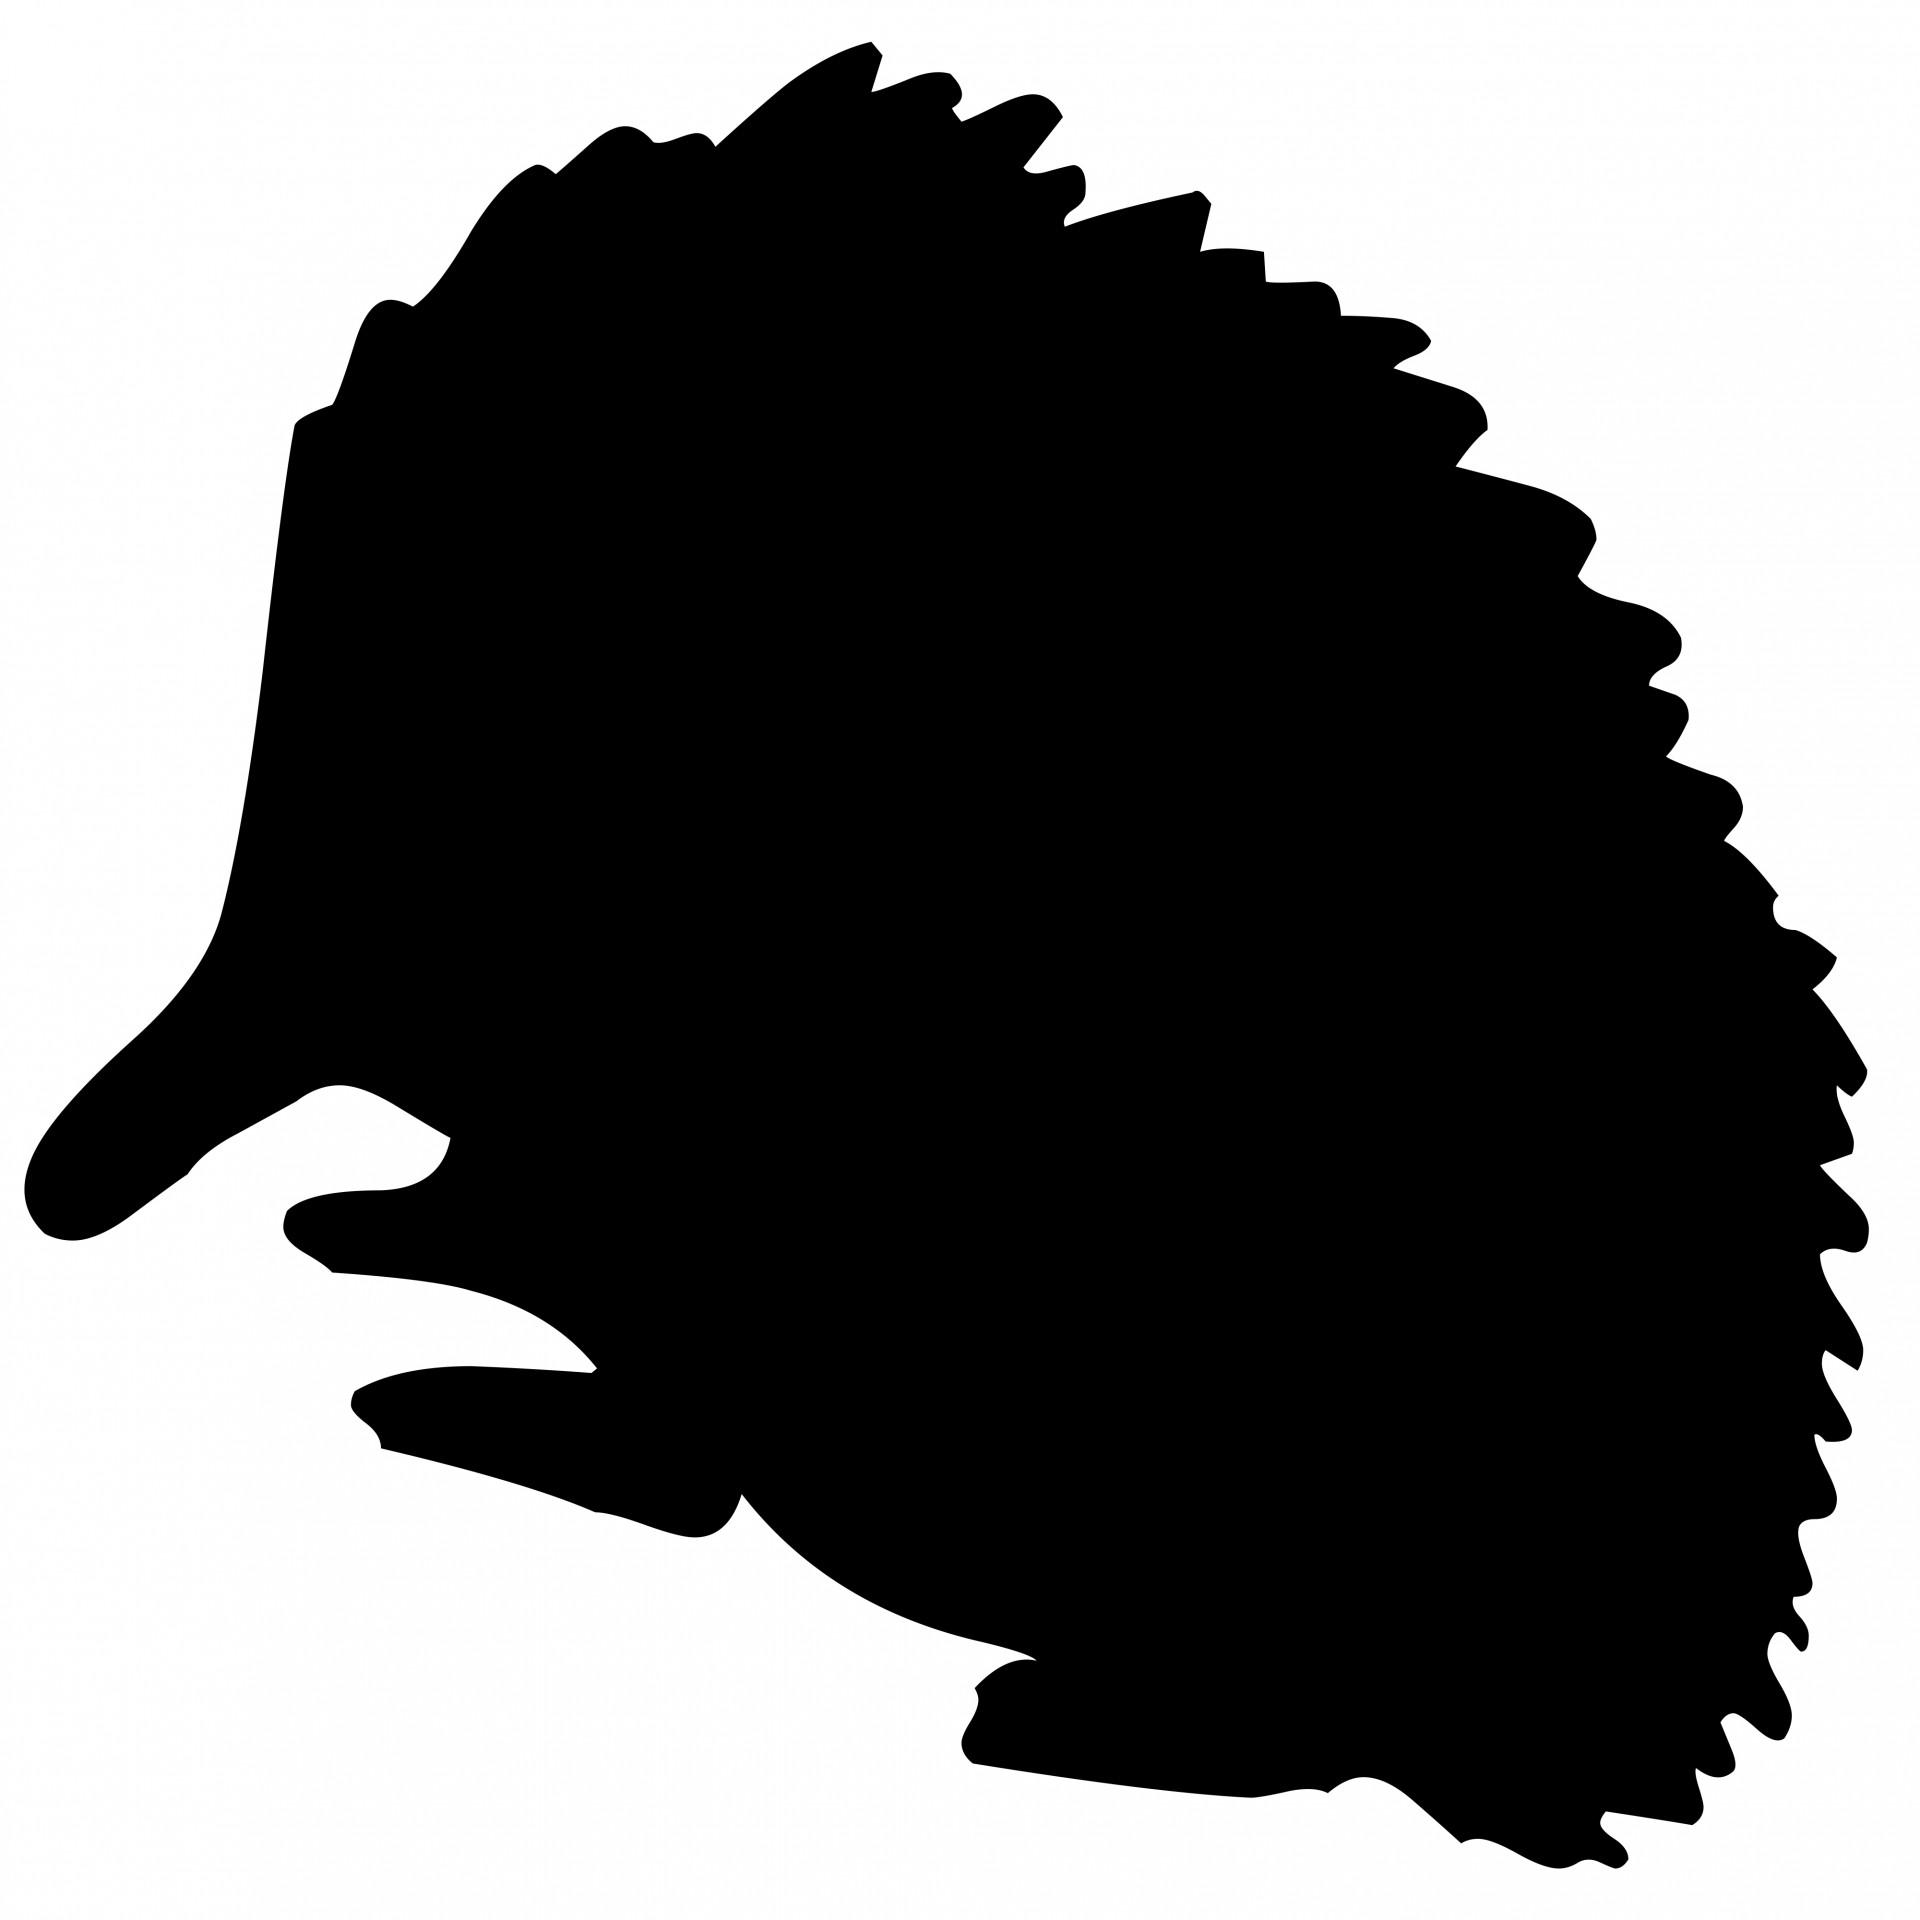 1920x1920 Hedgehog Free Stock Photo